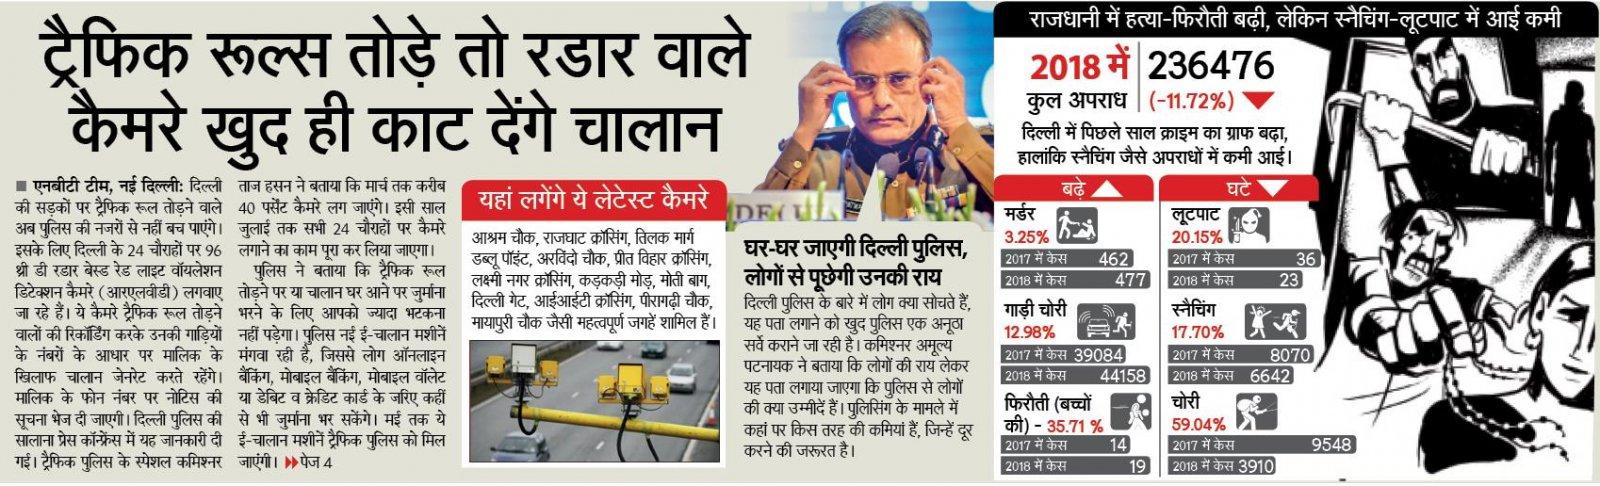 CHallan by sms Delhi 73942.jpg